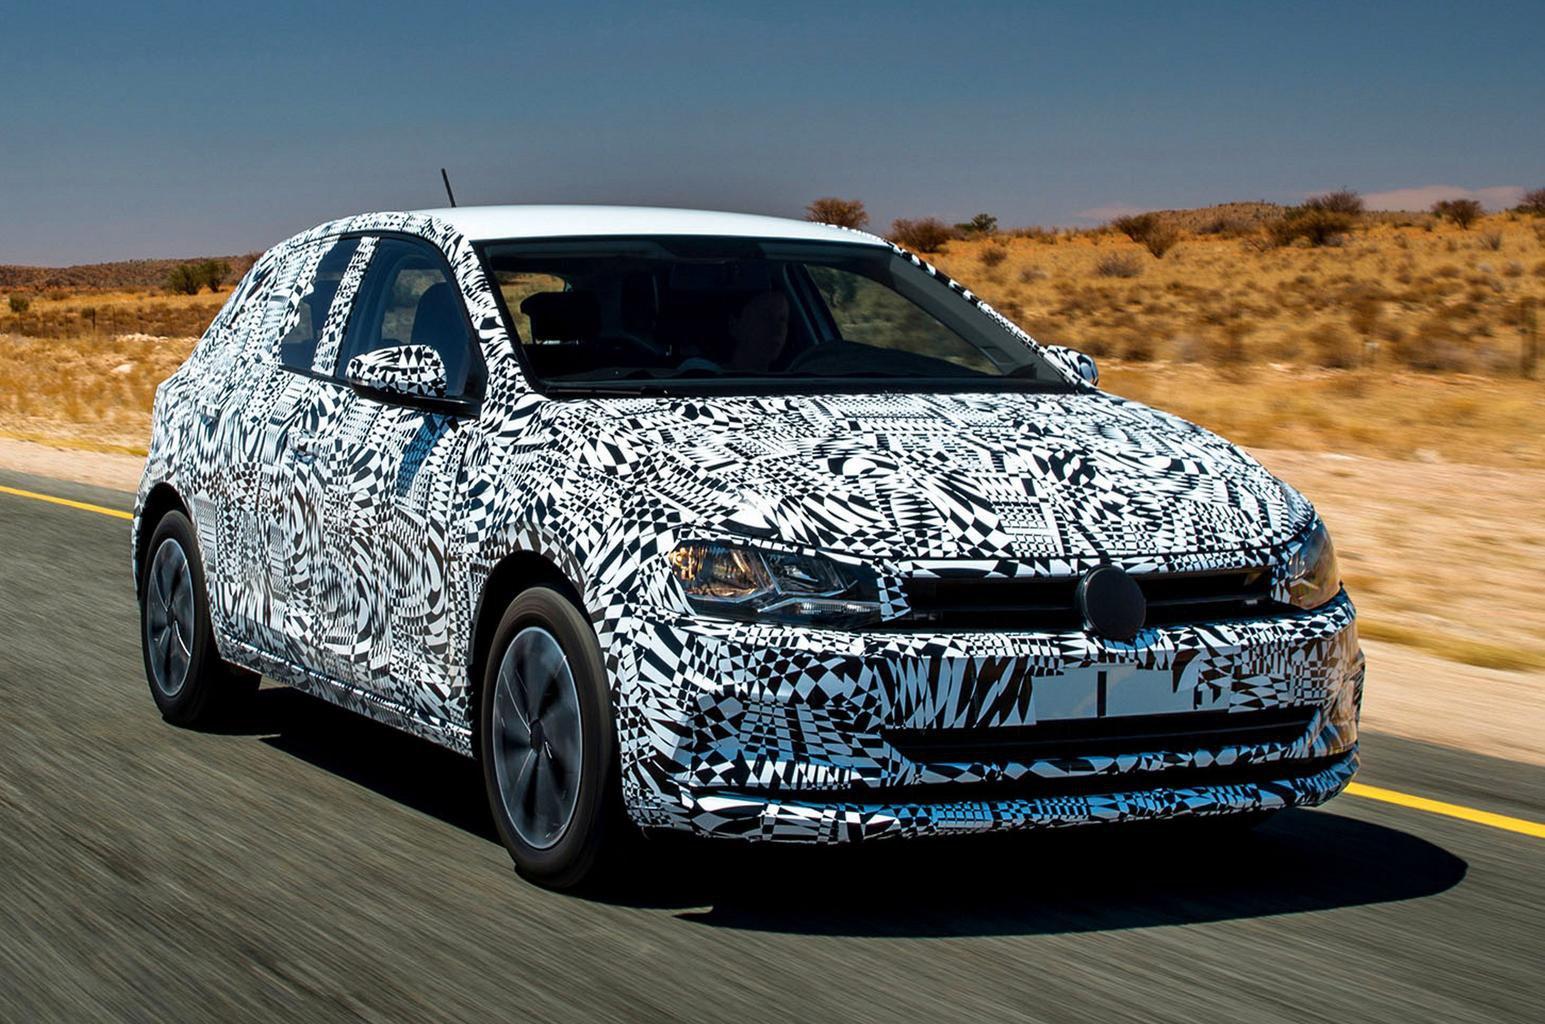 Volkswagen Polo prototype 2018 review